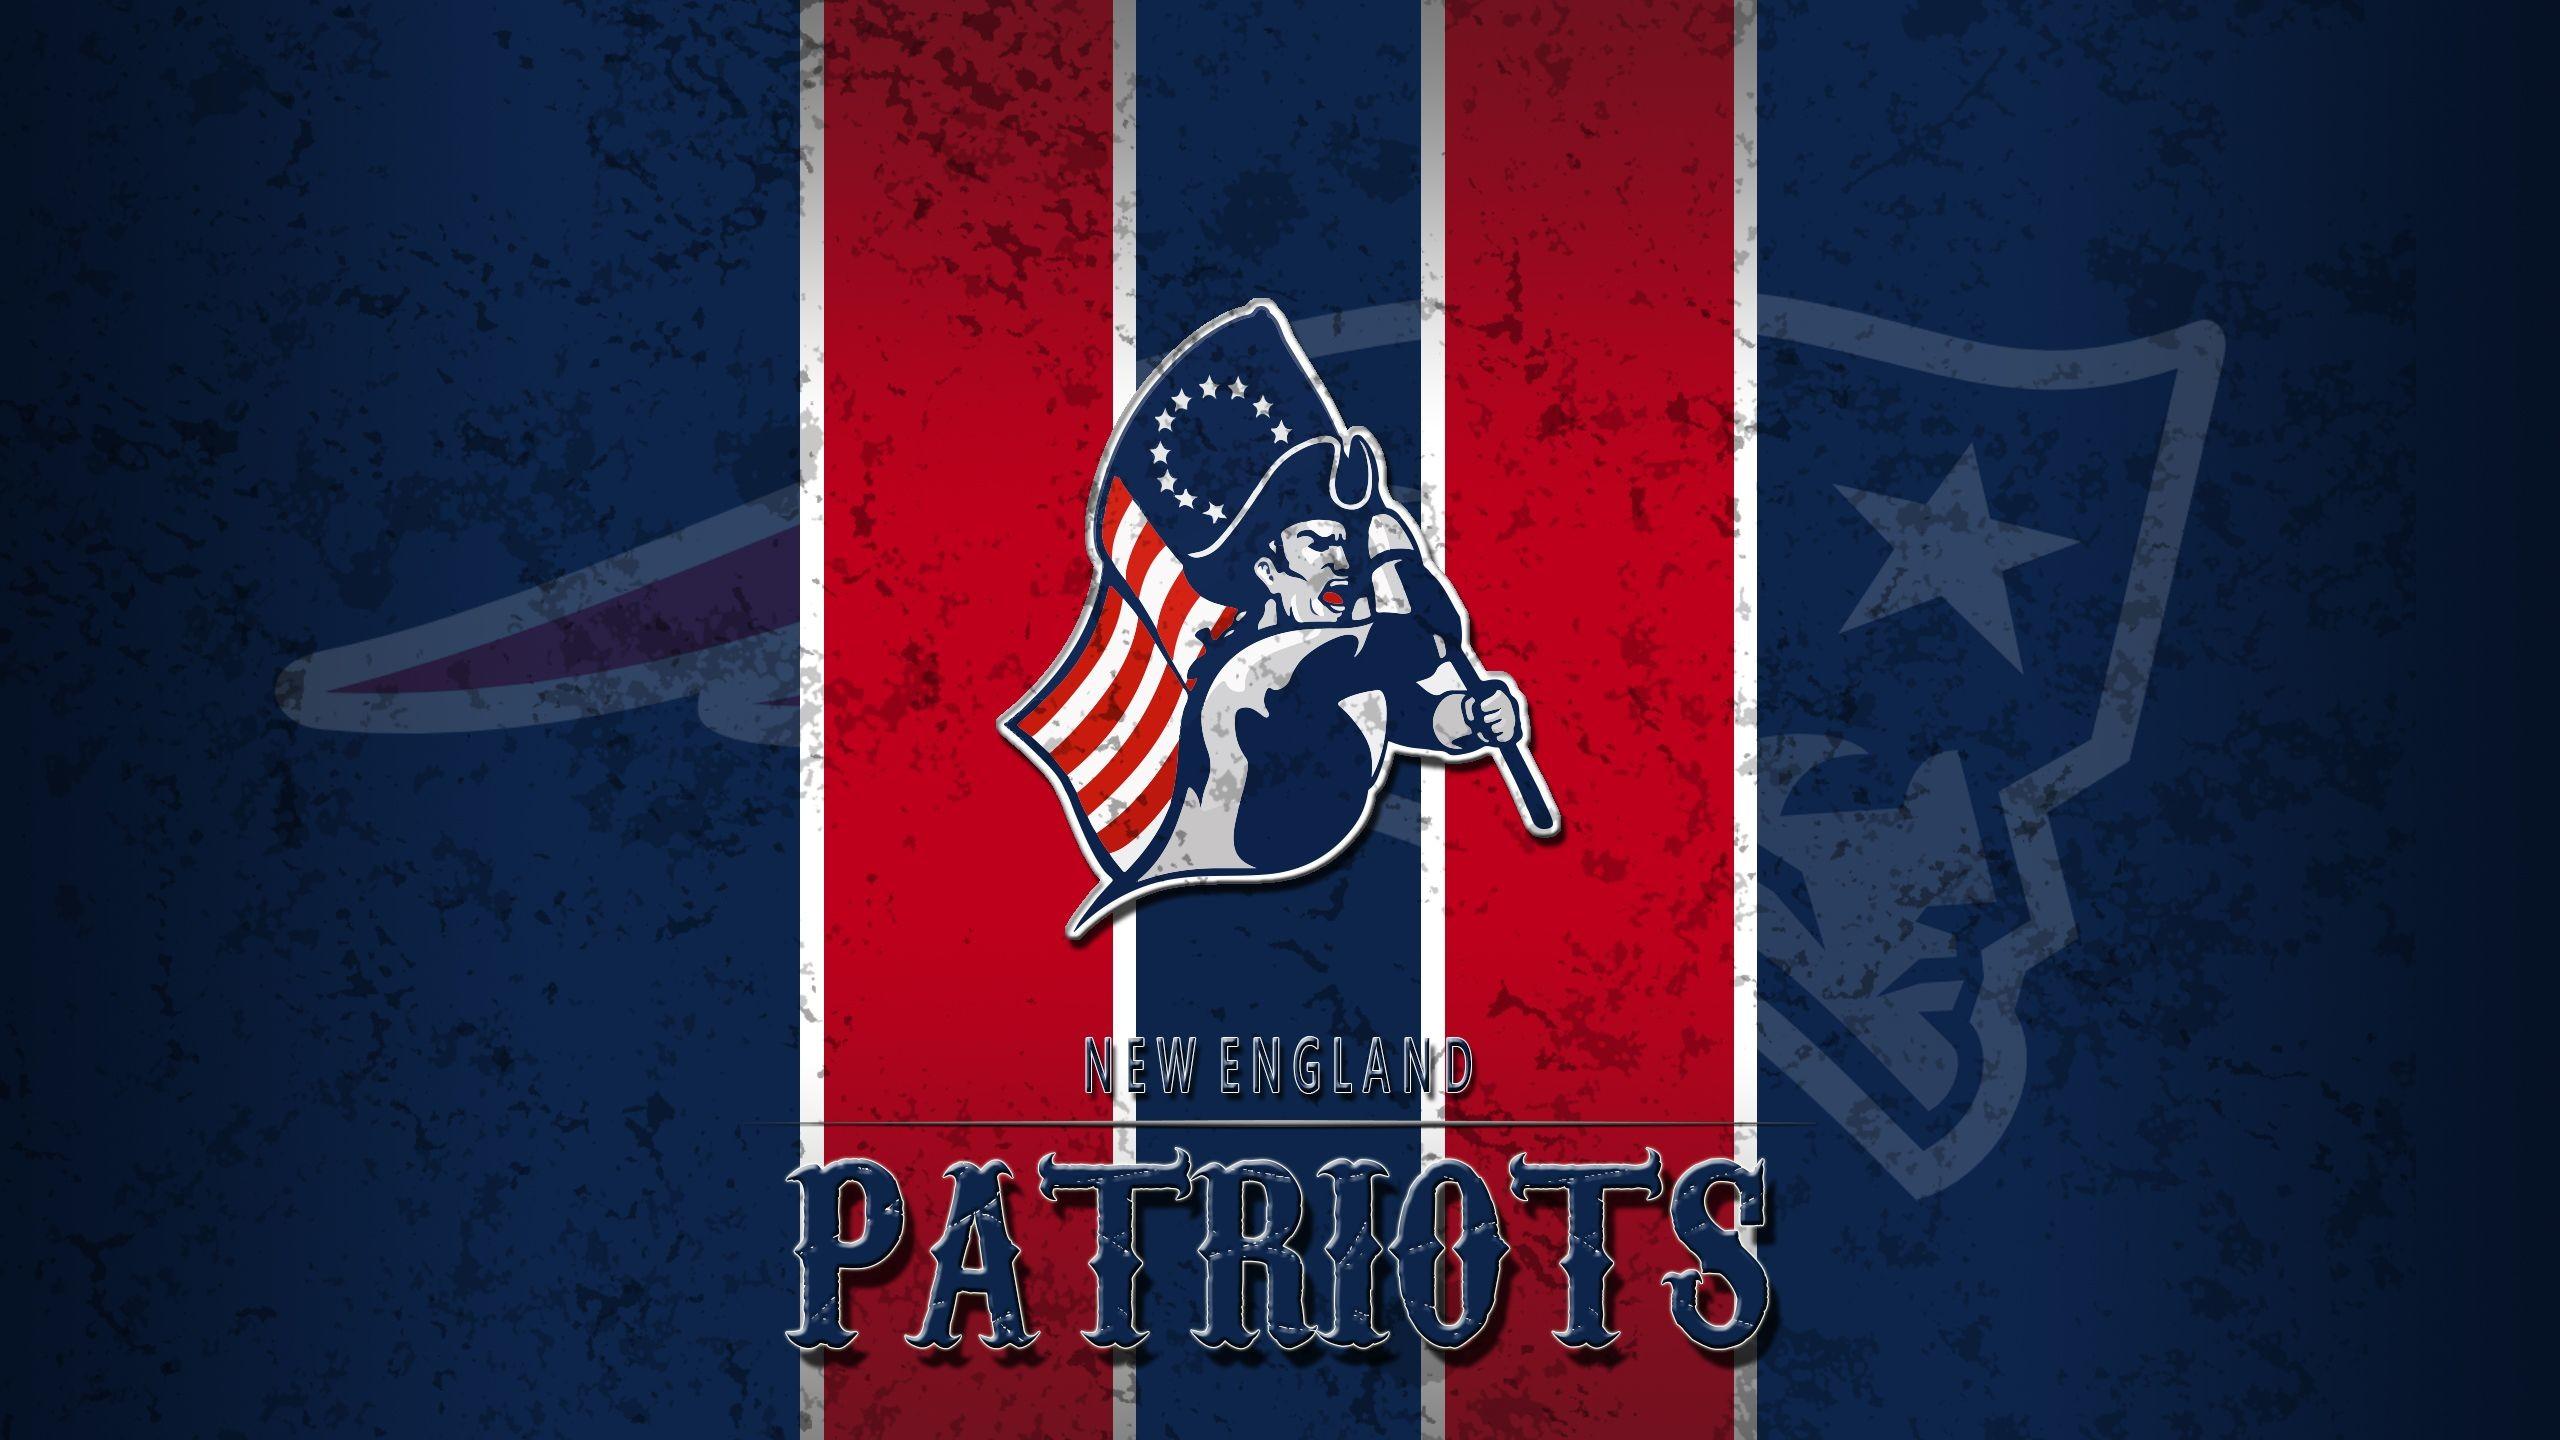 NFL Team Logo New England Patriots wallpaper HD. Free desktop .